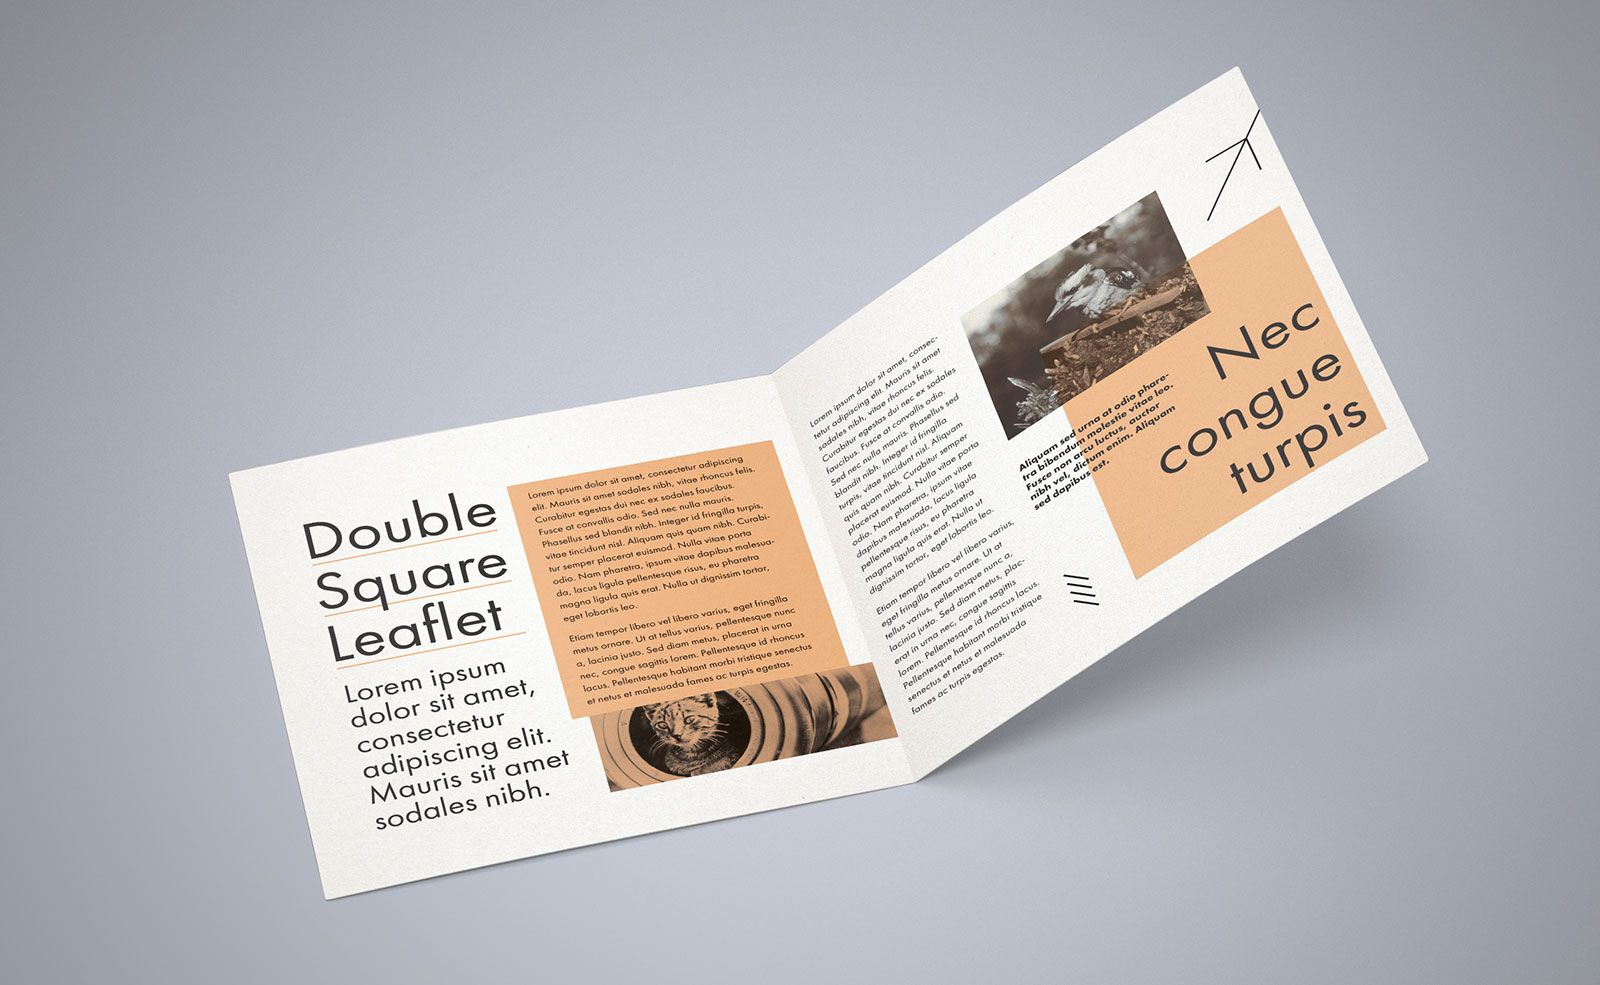 Free Square Bi Fold Brochure Mockup Psd File 2 | Bi Fold Within 2 Fold Brochure Template Psd